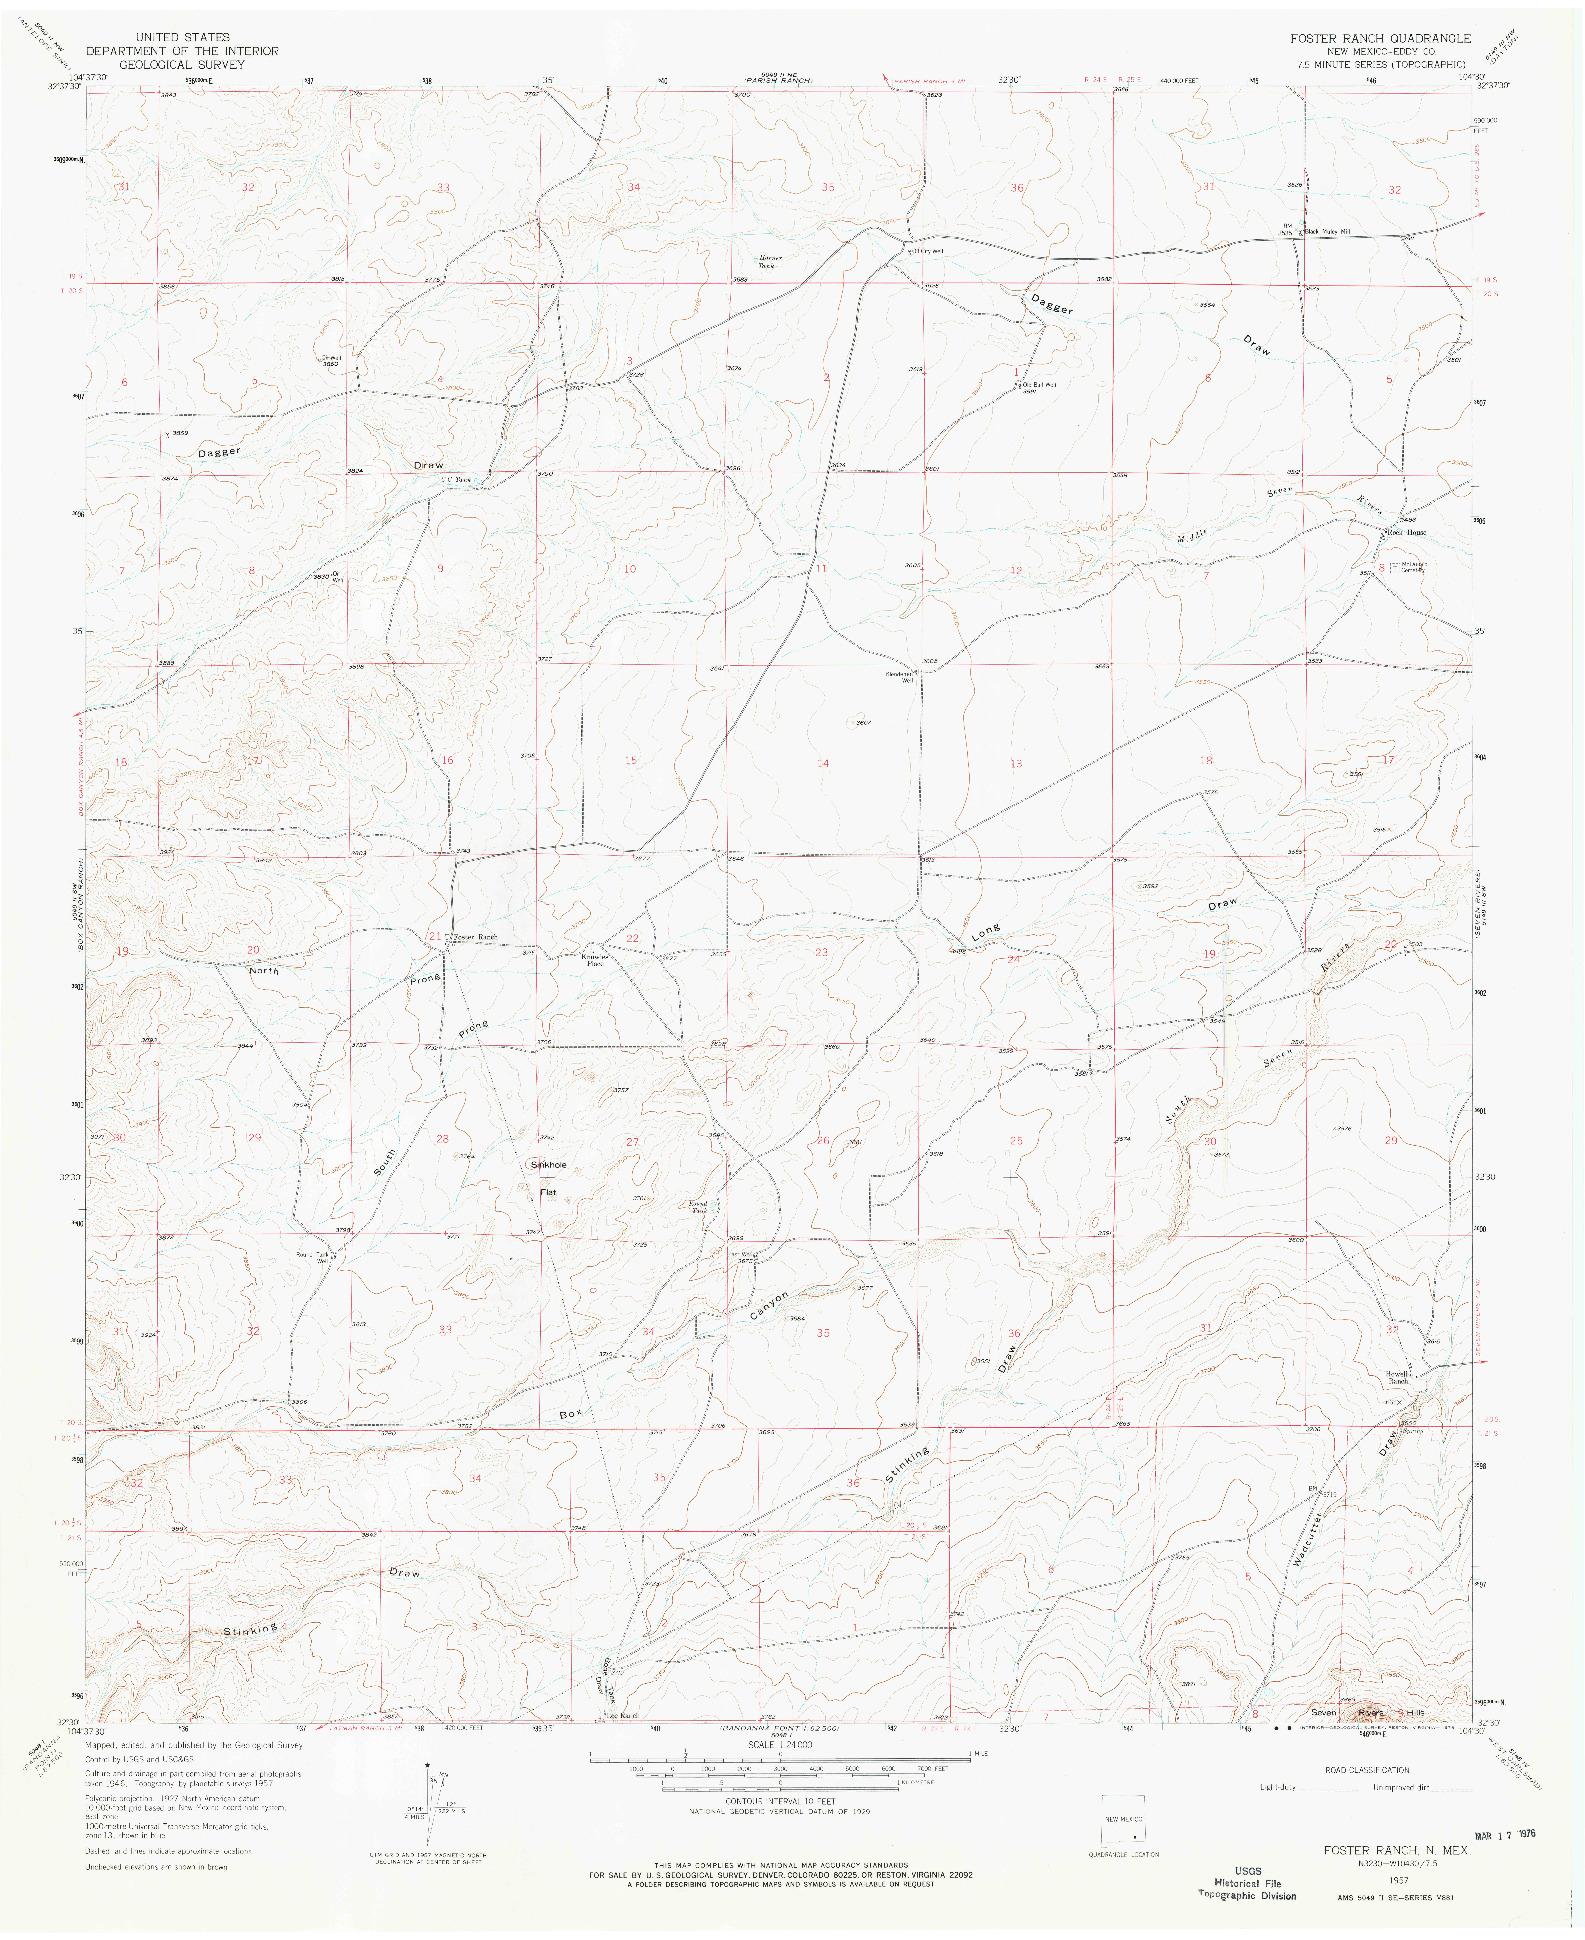 USGS 1:24000-SCALE QUADRANGLE FOR FOSTER RANCH, NM 1957